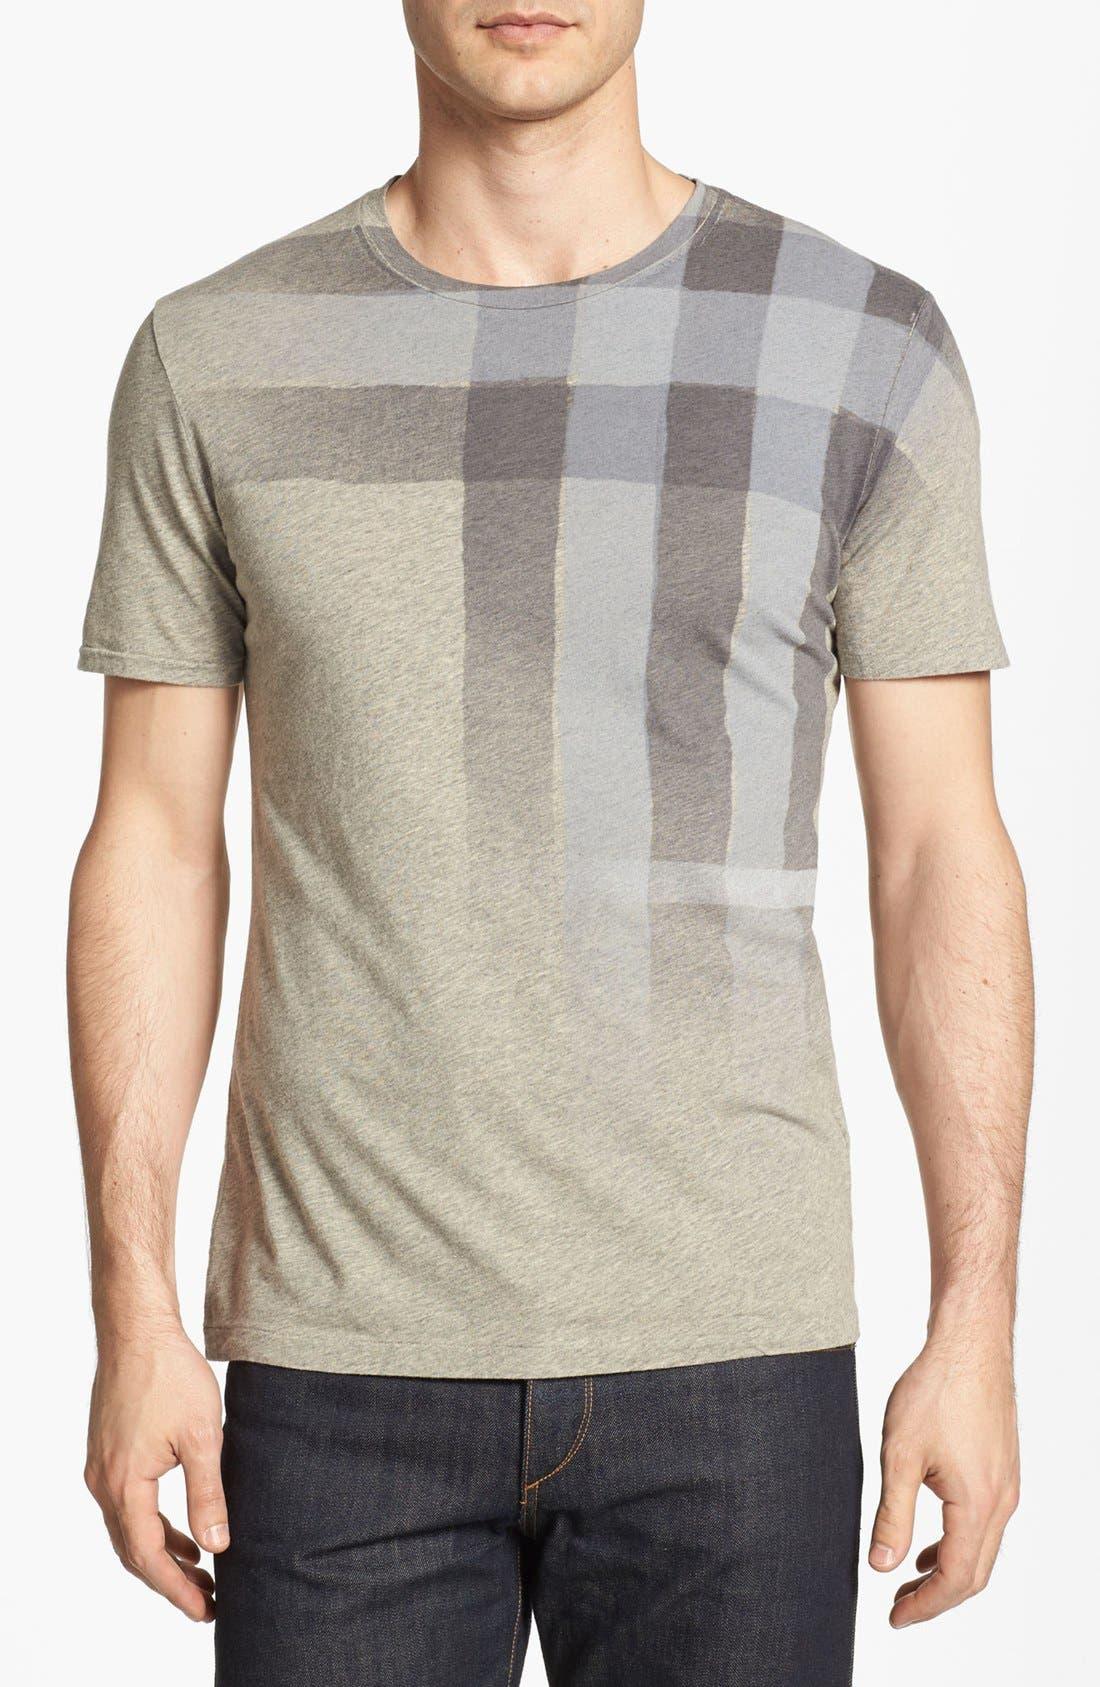 Alternate Image 1 Selected - Burberry Brit 'Eburne' Waterprint Check T-Shirt